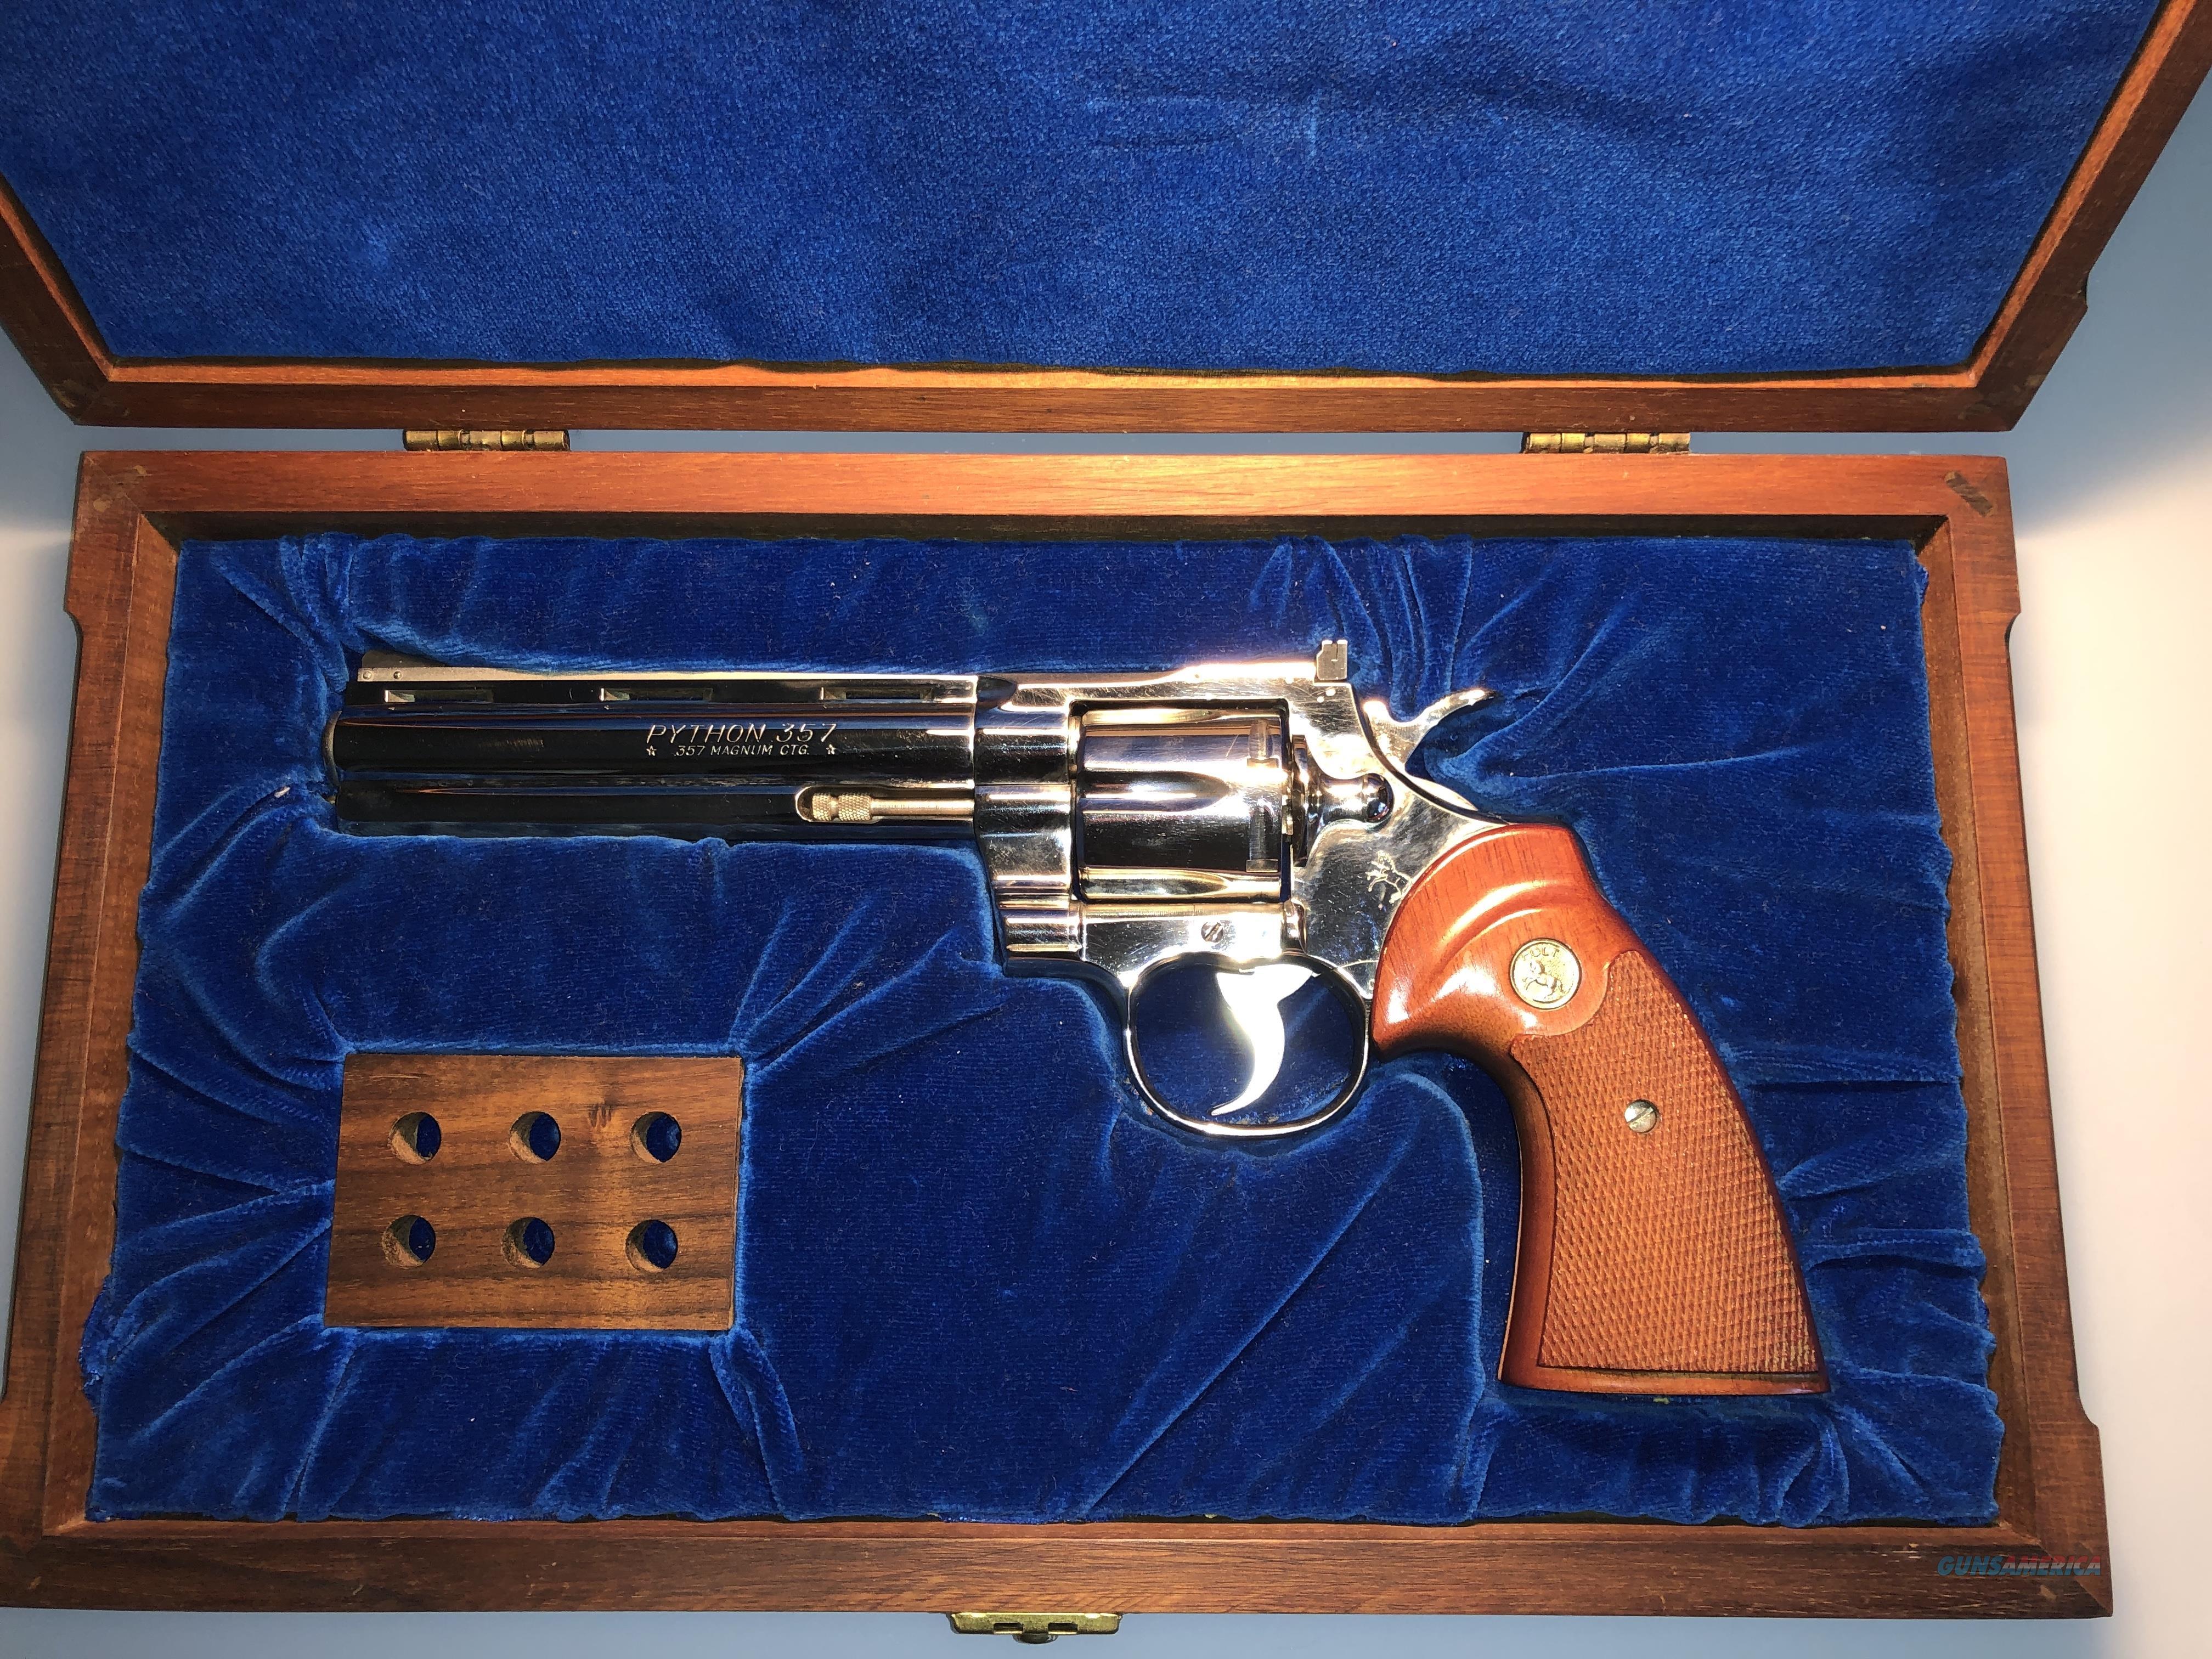 "Colt Python .357 Magnum - 6"" Barrel - Nickel Finish - With Display Case - Like New  Guns > Pistols > Colt Double Action Revolvers- Modern"